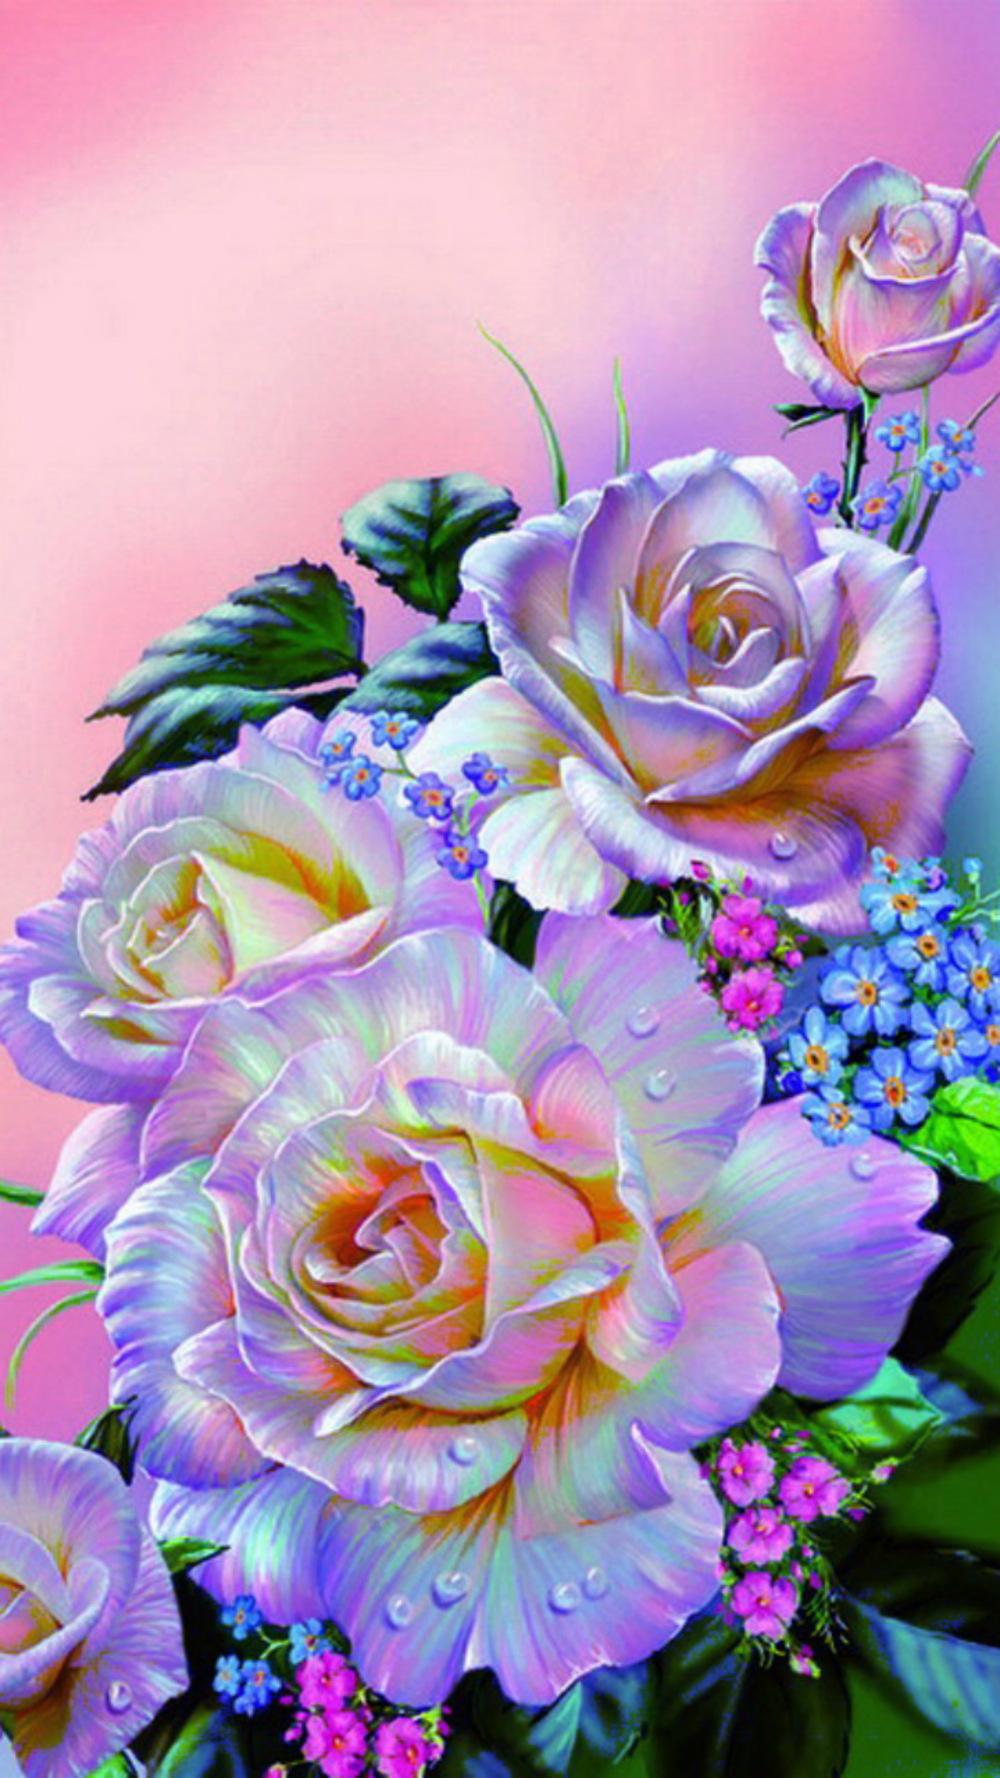 обои на телефон цветы картинки